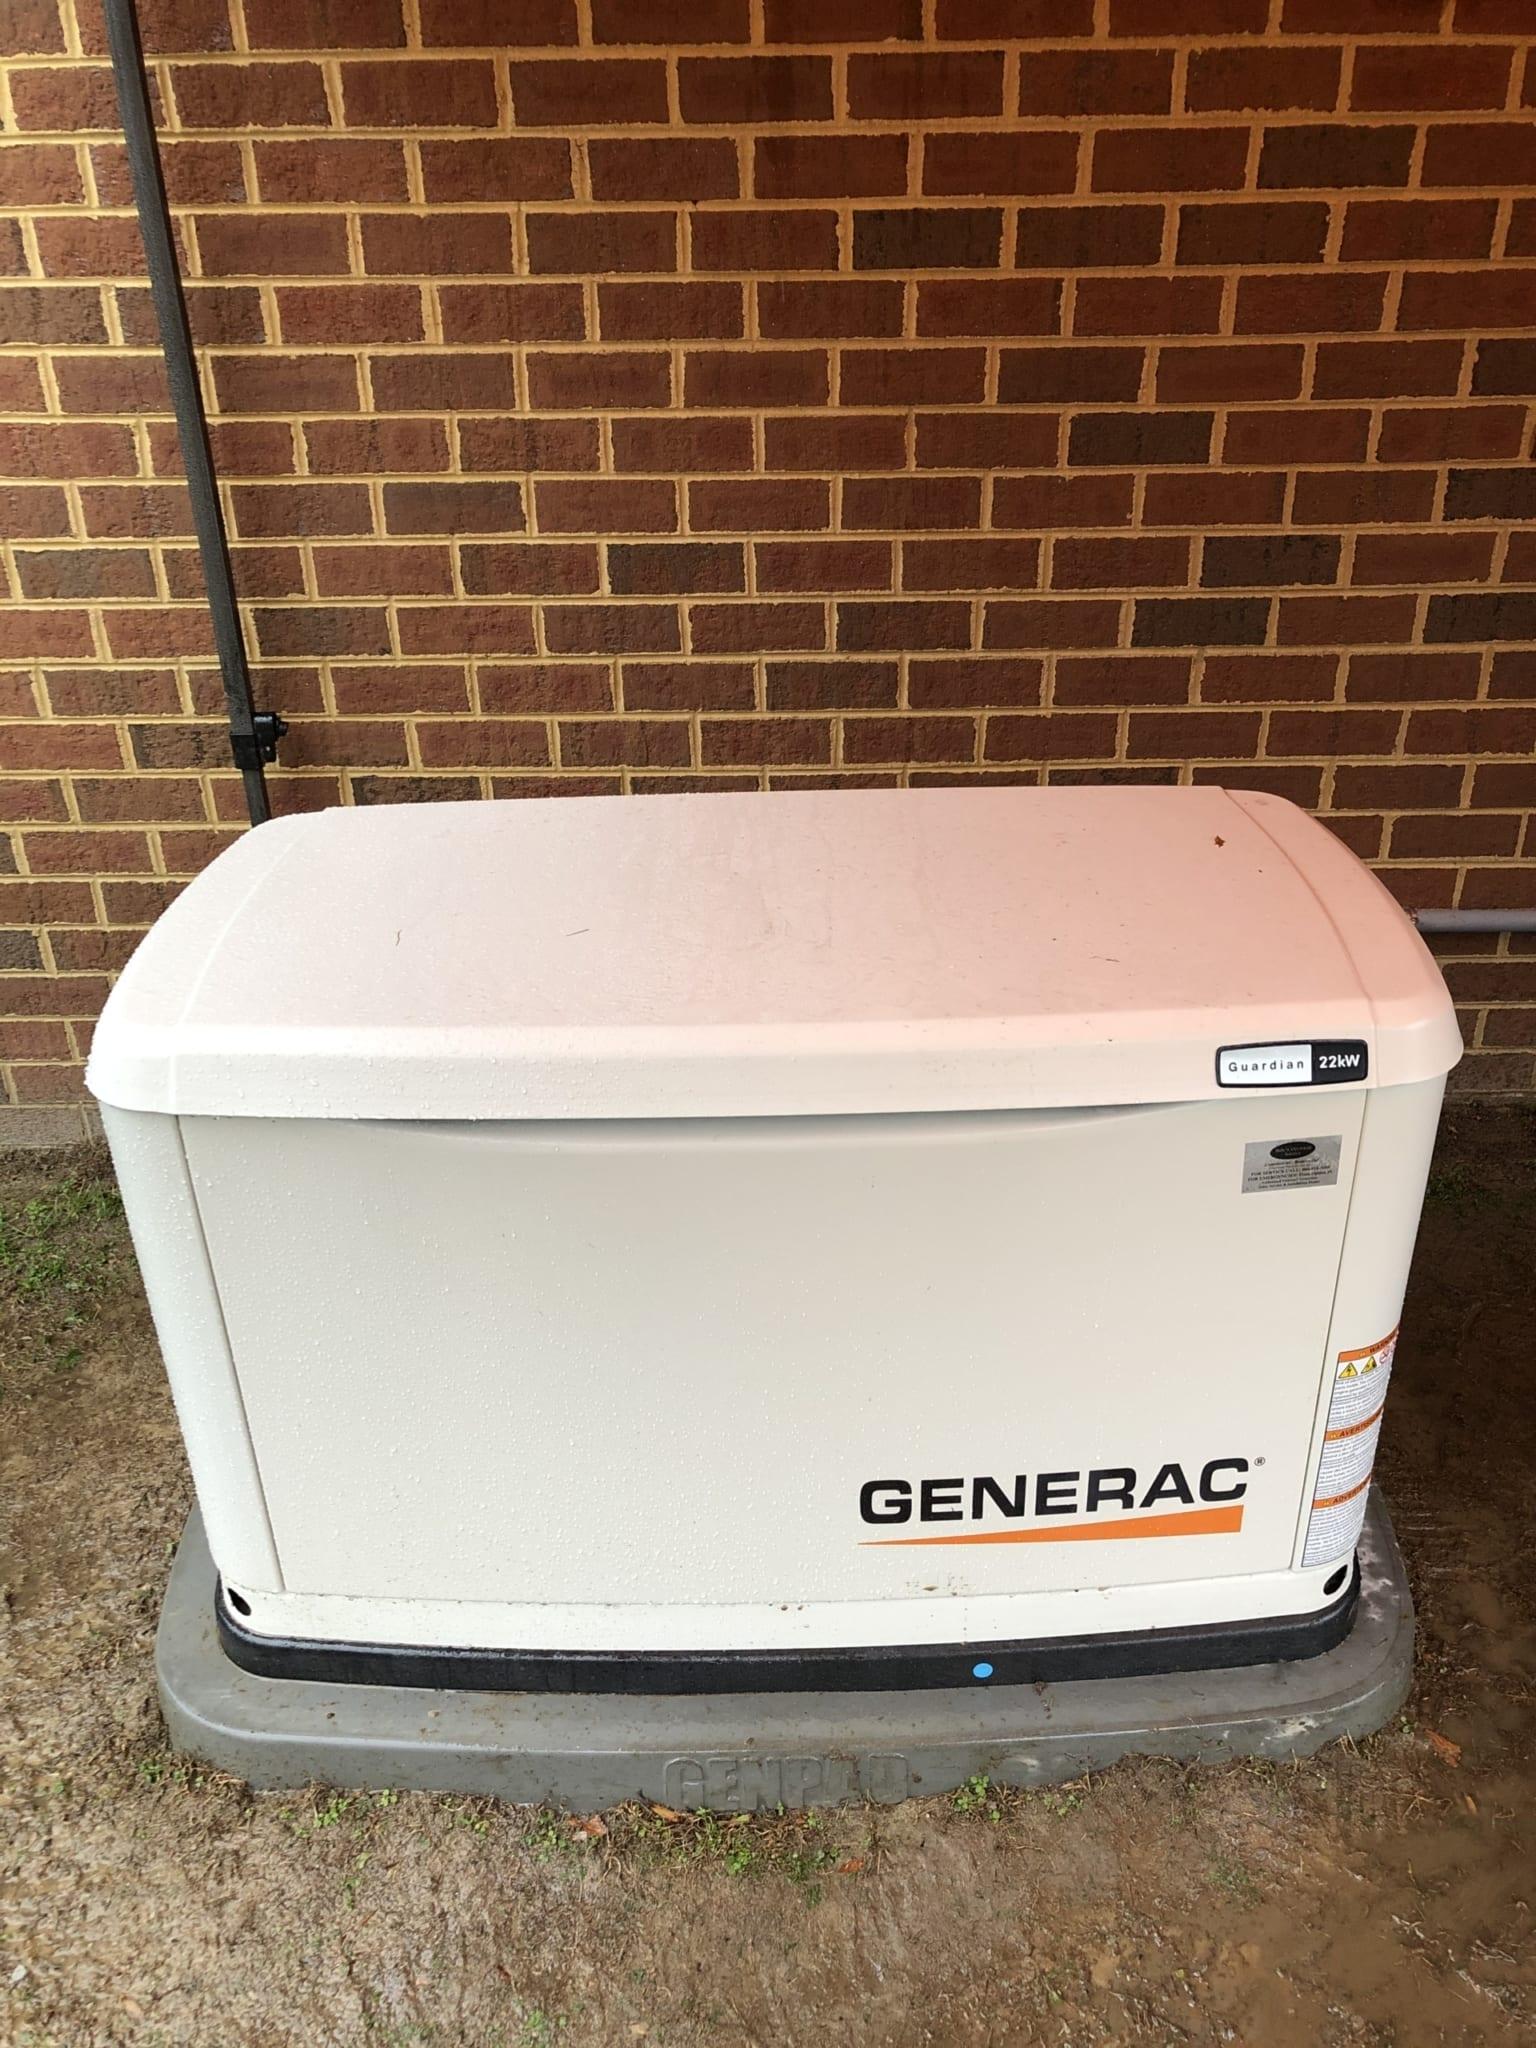 12.16.20 Chesterfield Generac Automatic Standby Generator